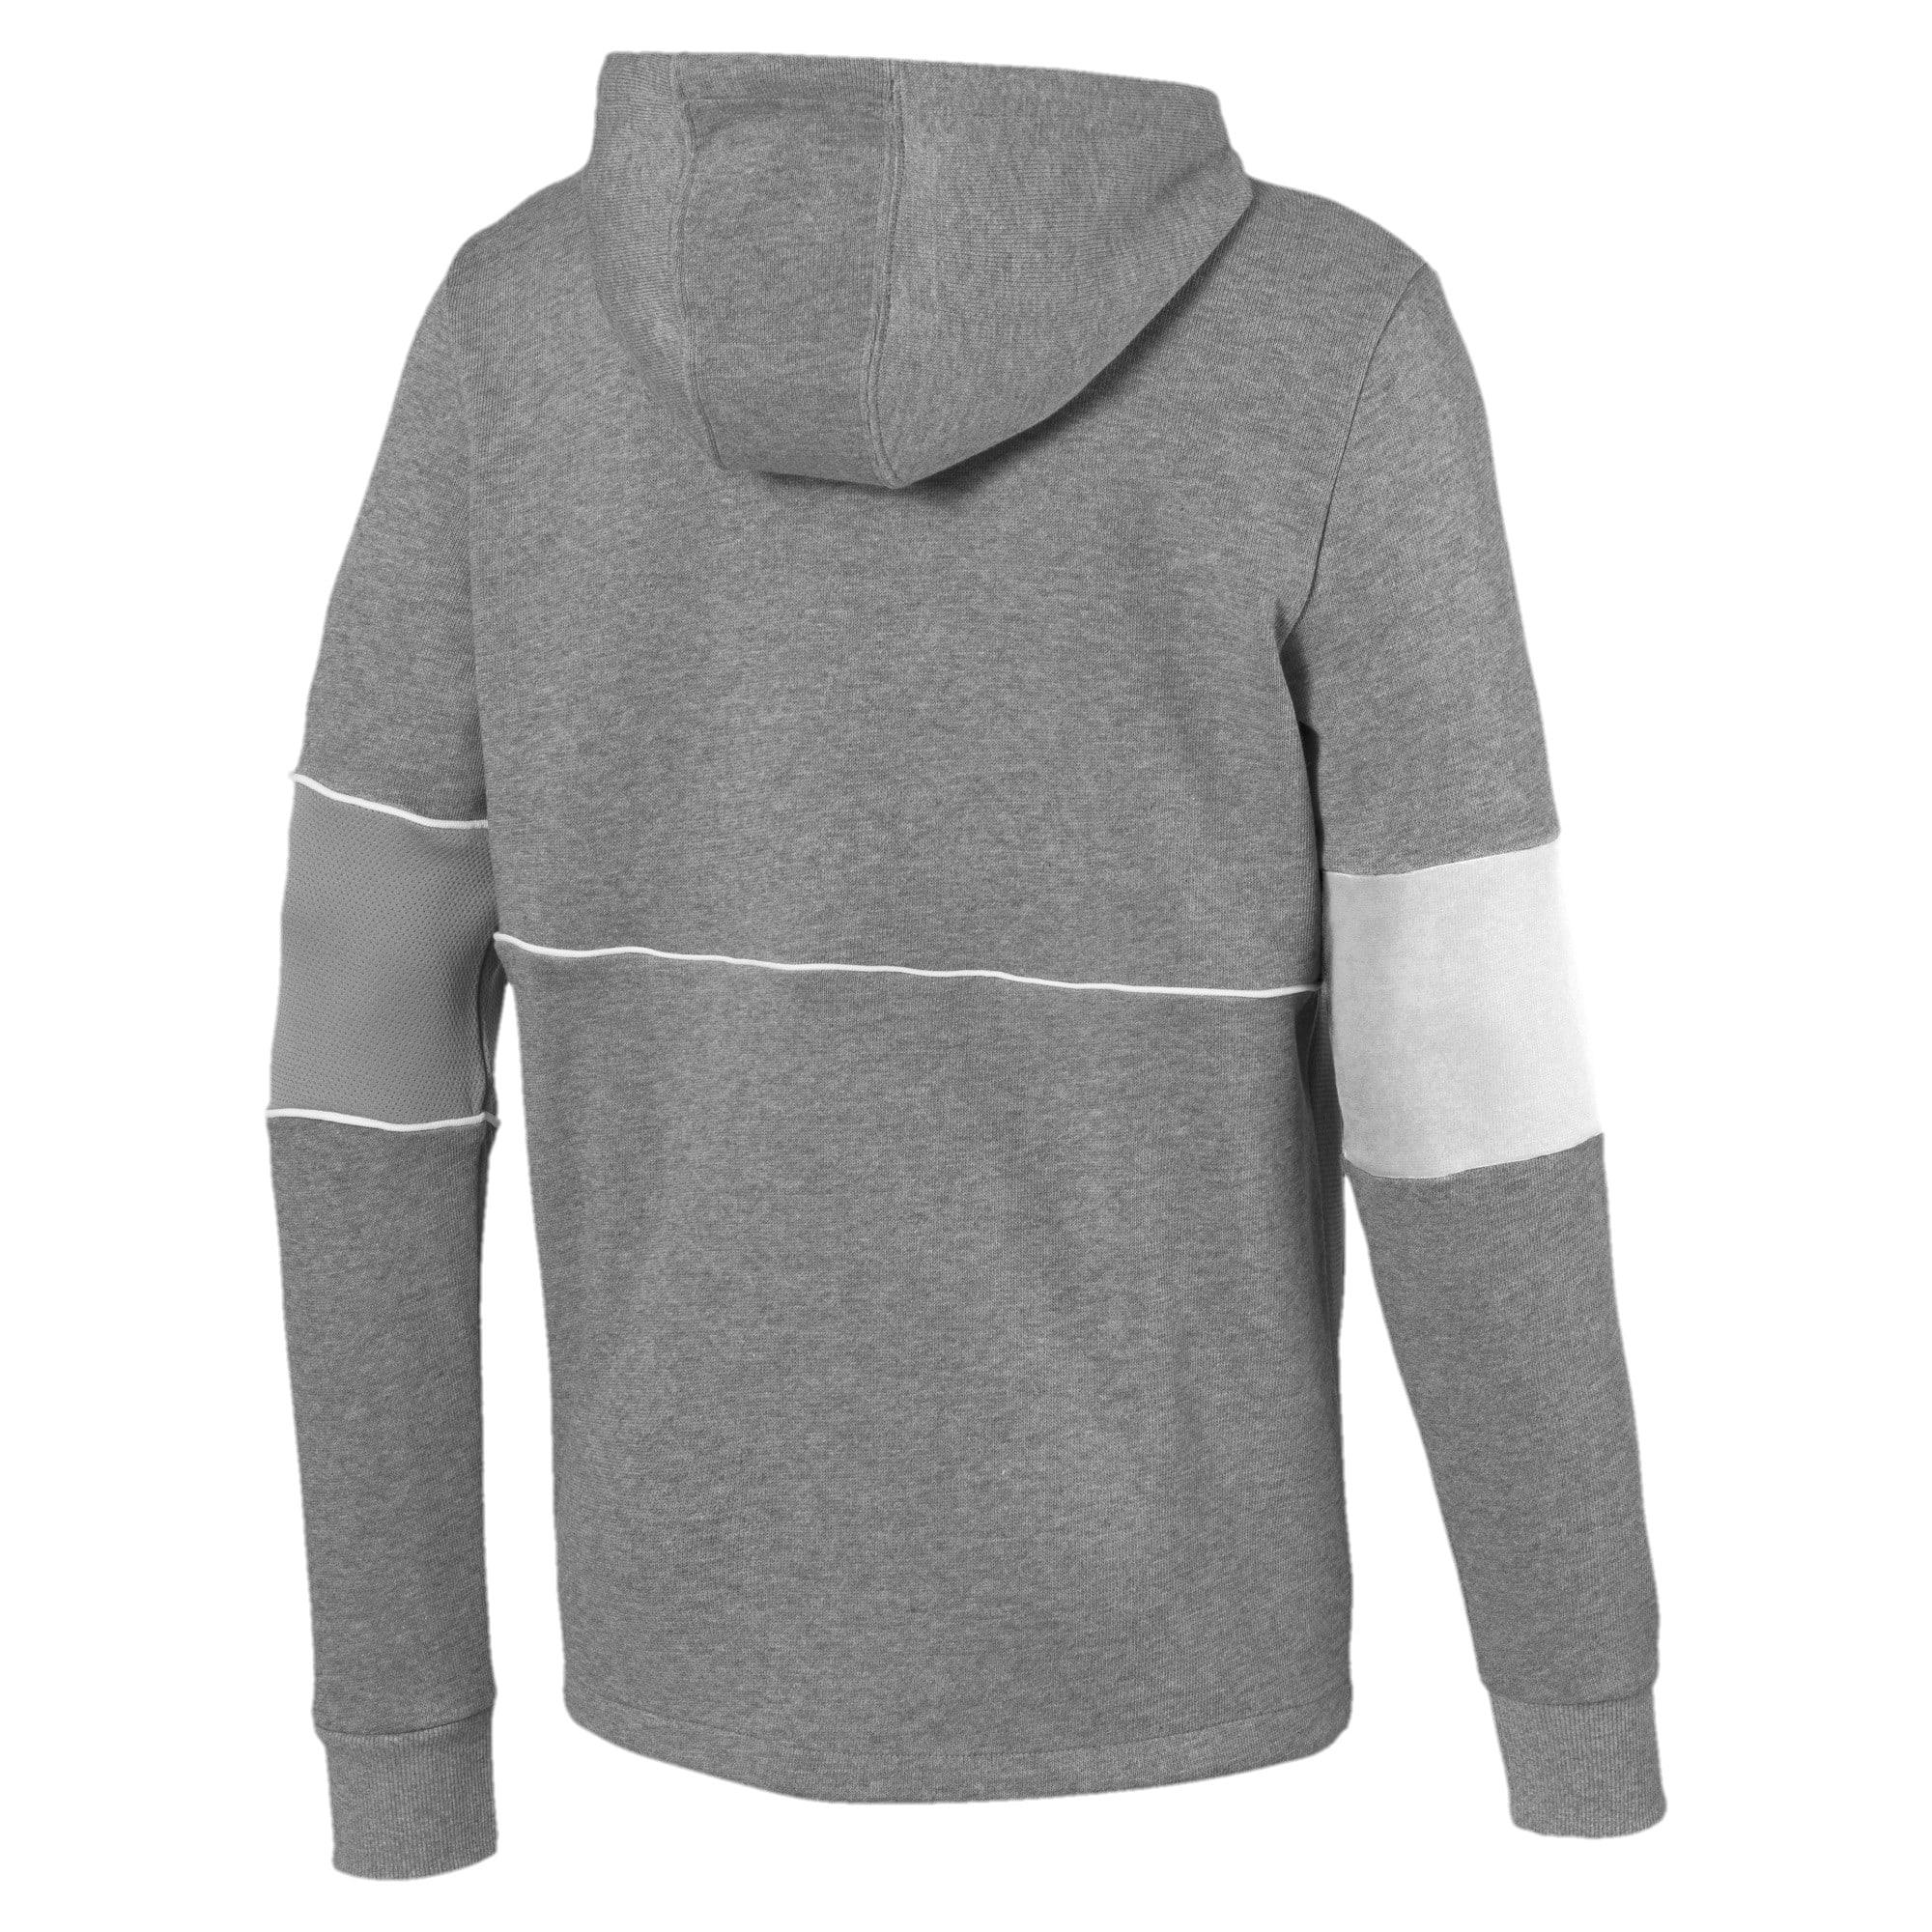 Thumbnail 5 of Ferrari Hooded Zip-Up Men's Jacket, Medium Gray Heather, medium-IND